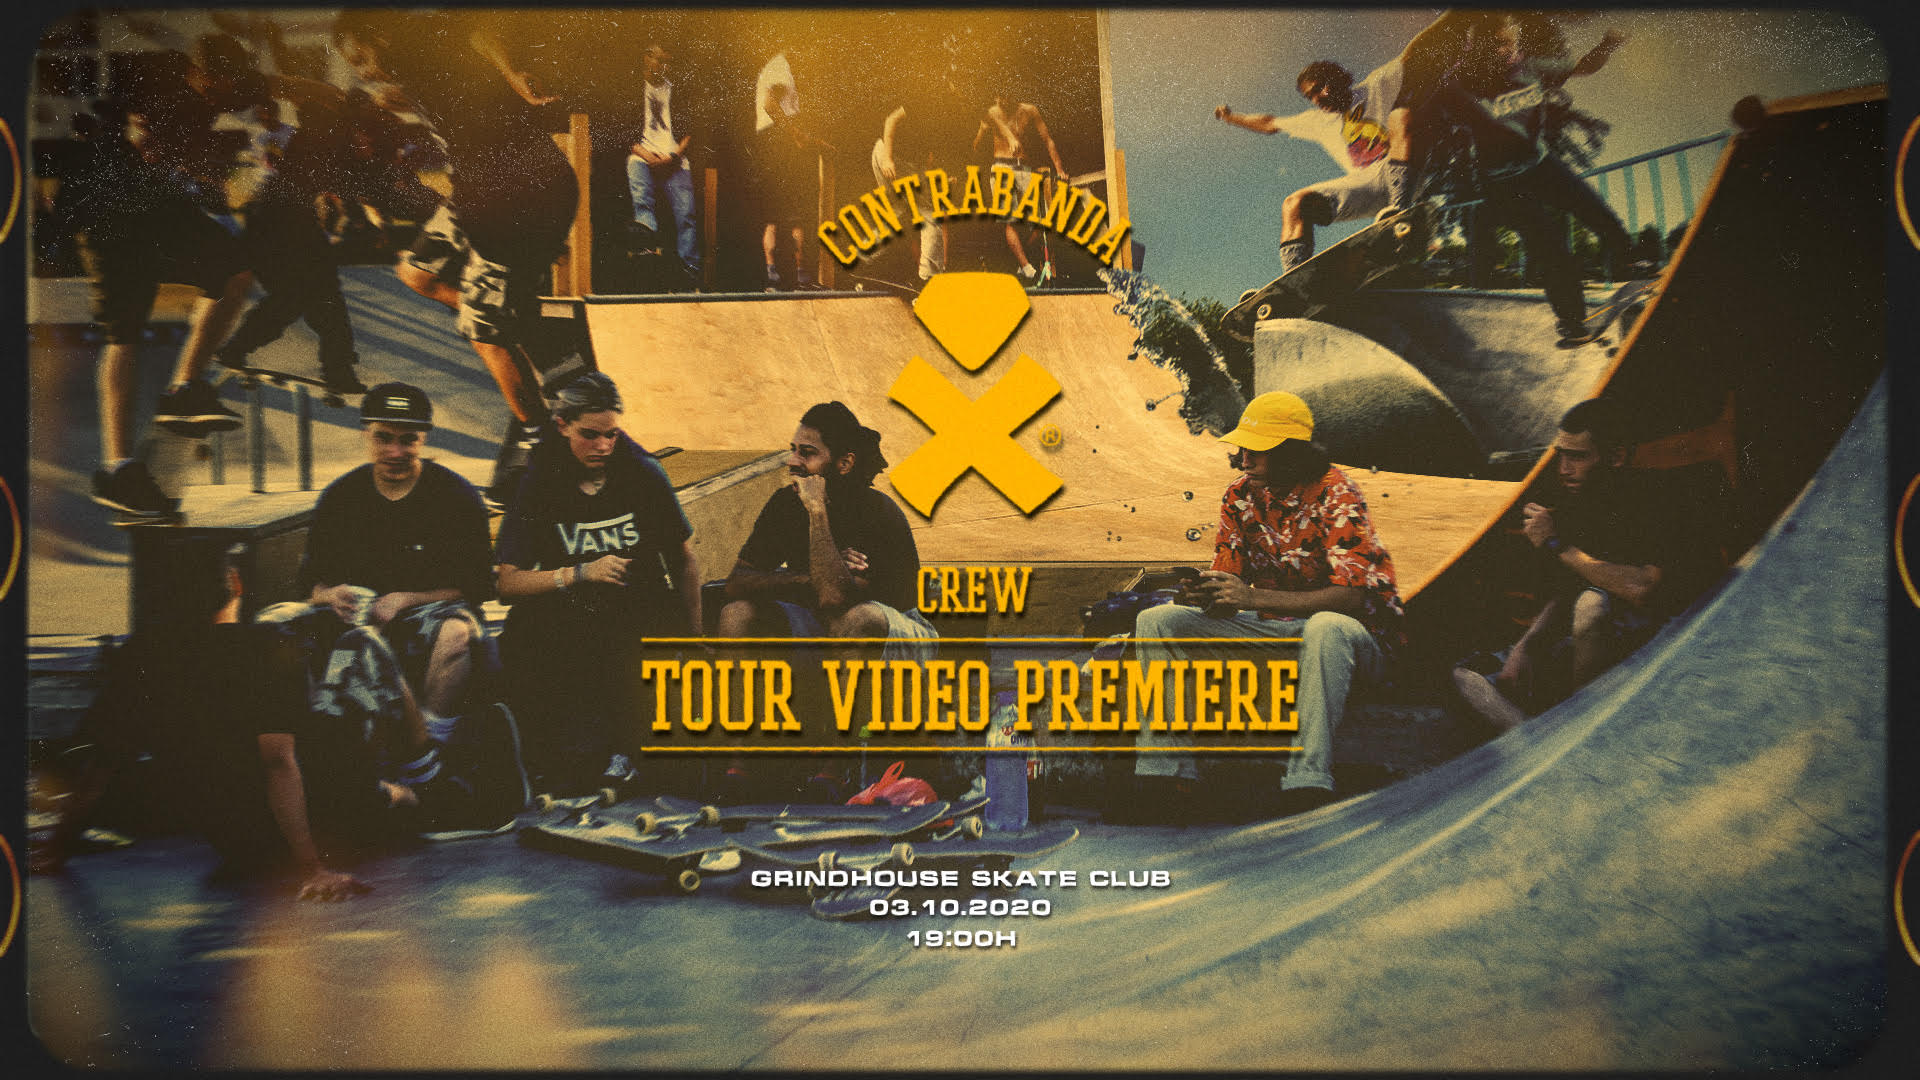 Contrabanda Crew Tour Video Premiere